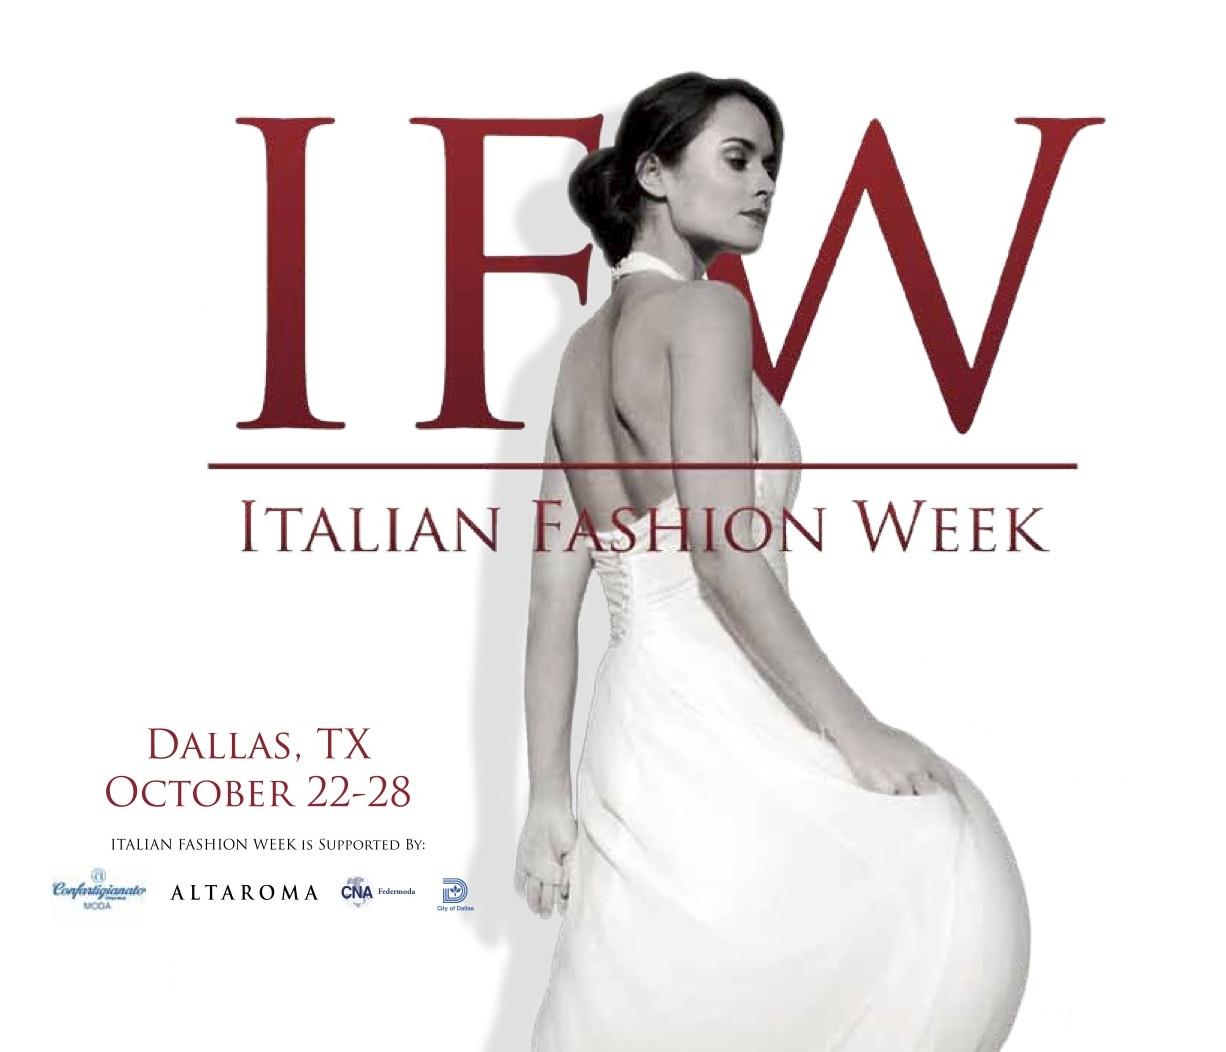 Italian Fashion Week Brings Made In Italy In Dallas Italians In Chicago